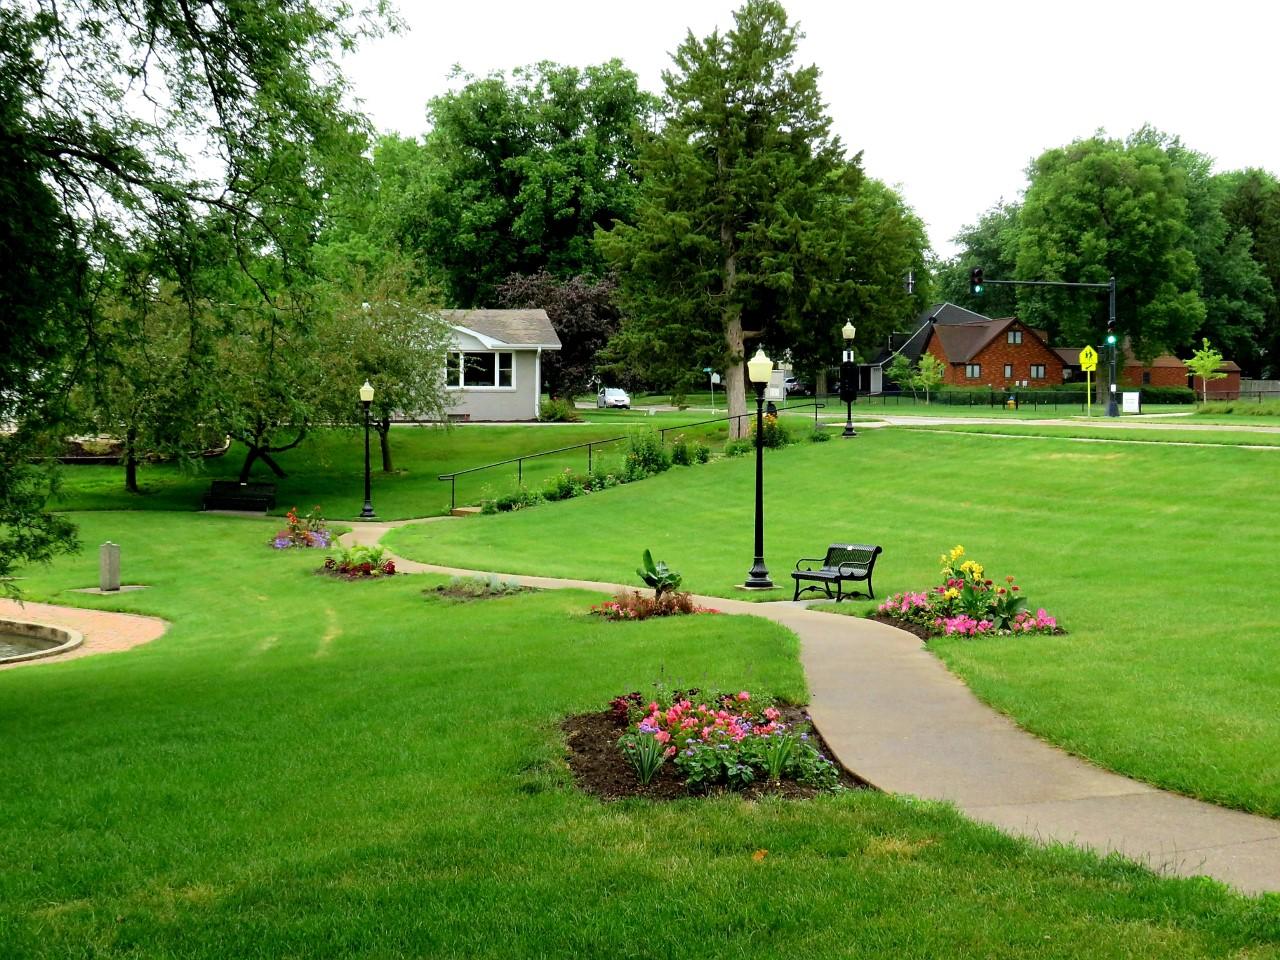 Sunken Gardens in Summer by FlowerChick.com